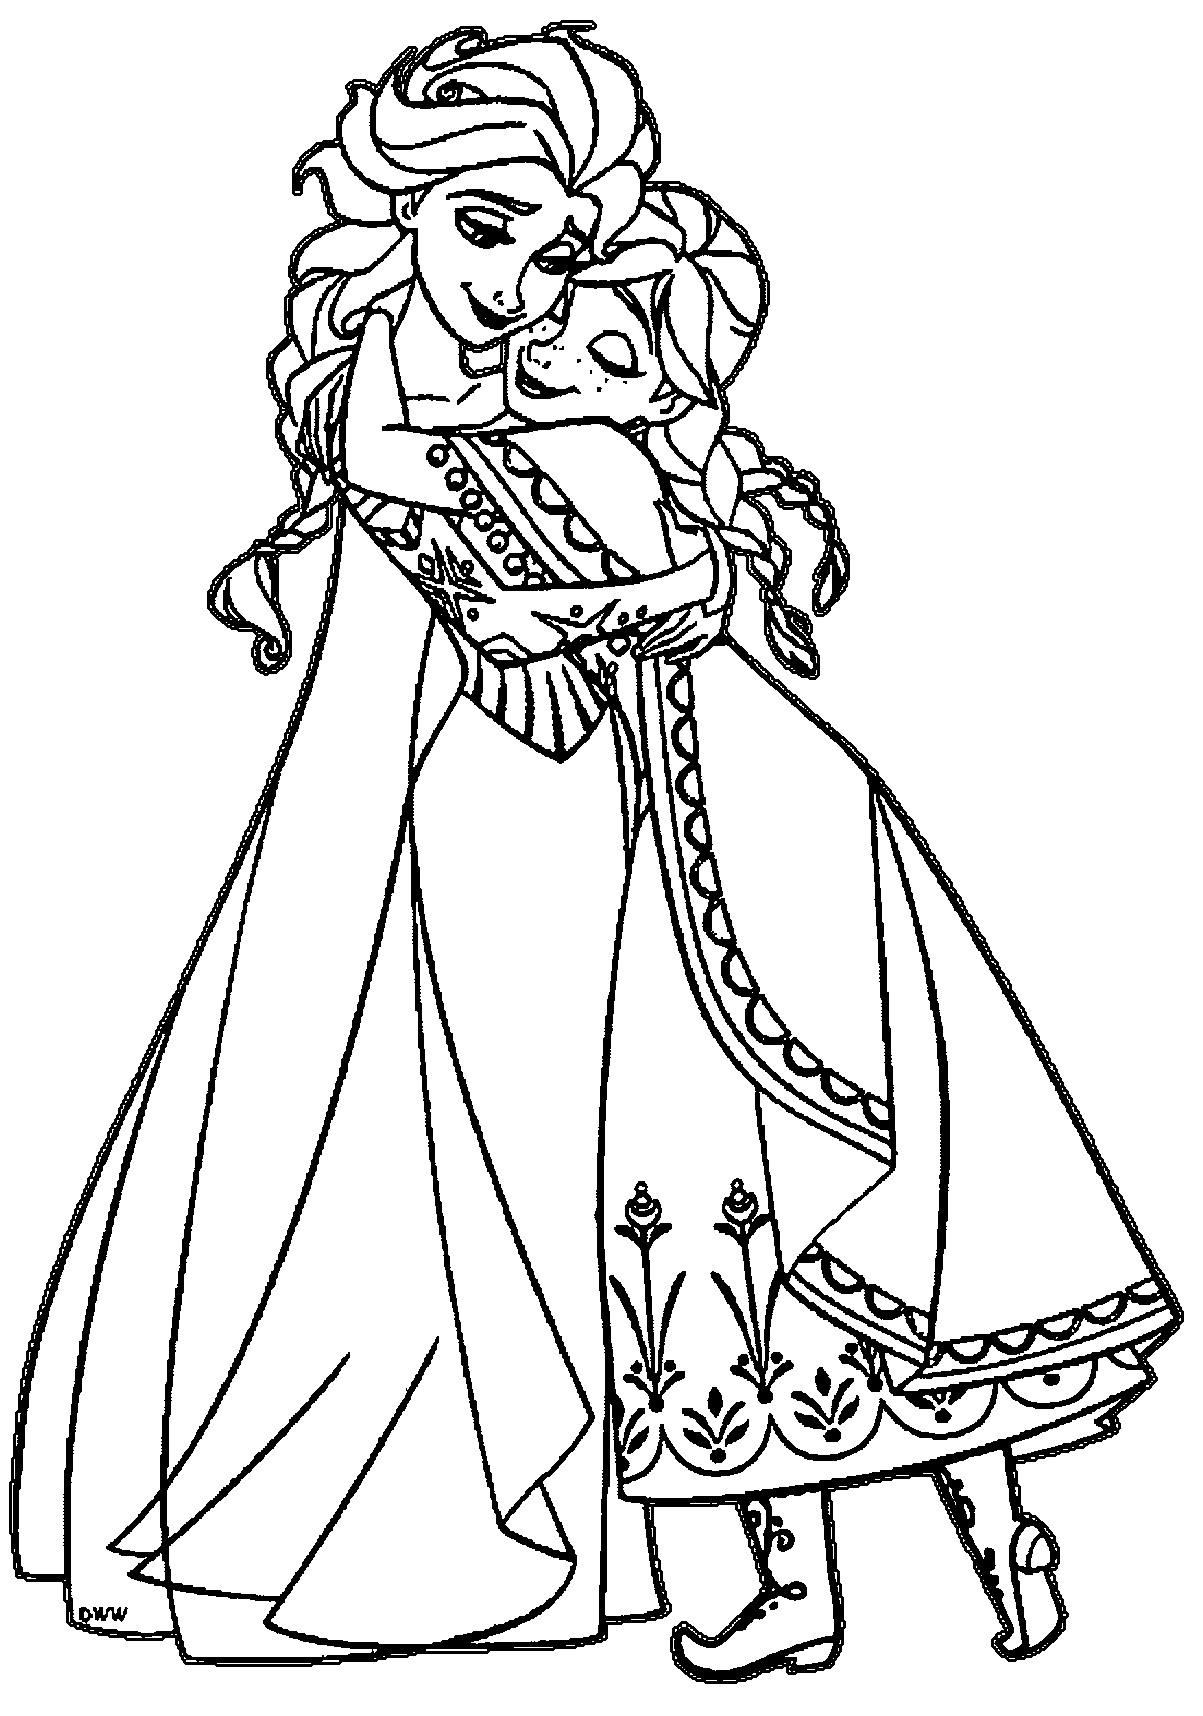 Princess Elsa And Anna Coloring Pages at GetColorings.com ...